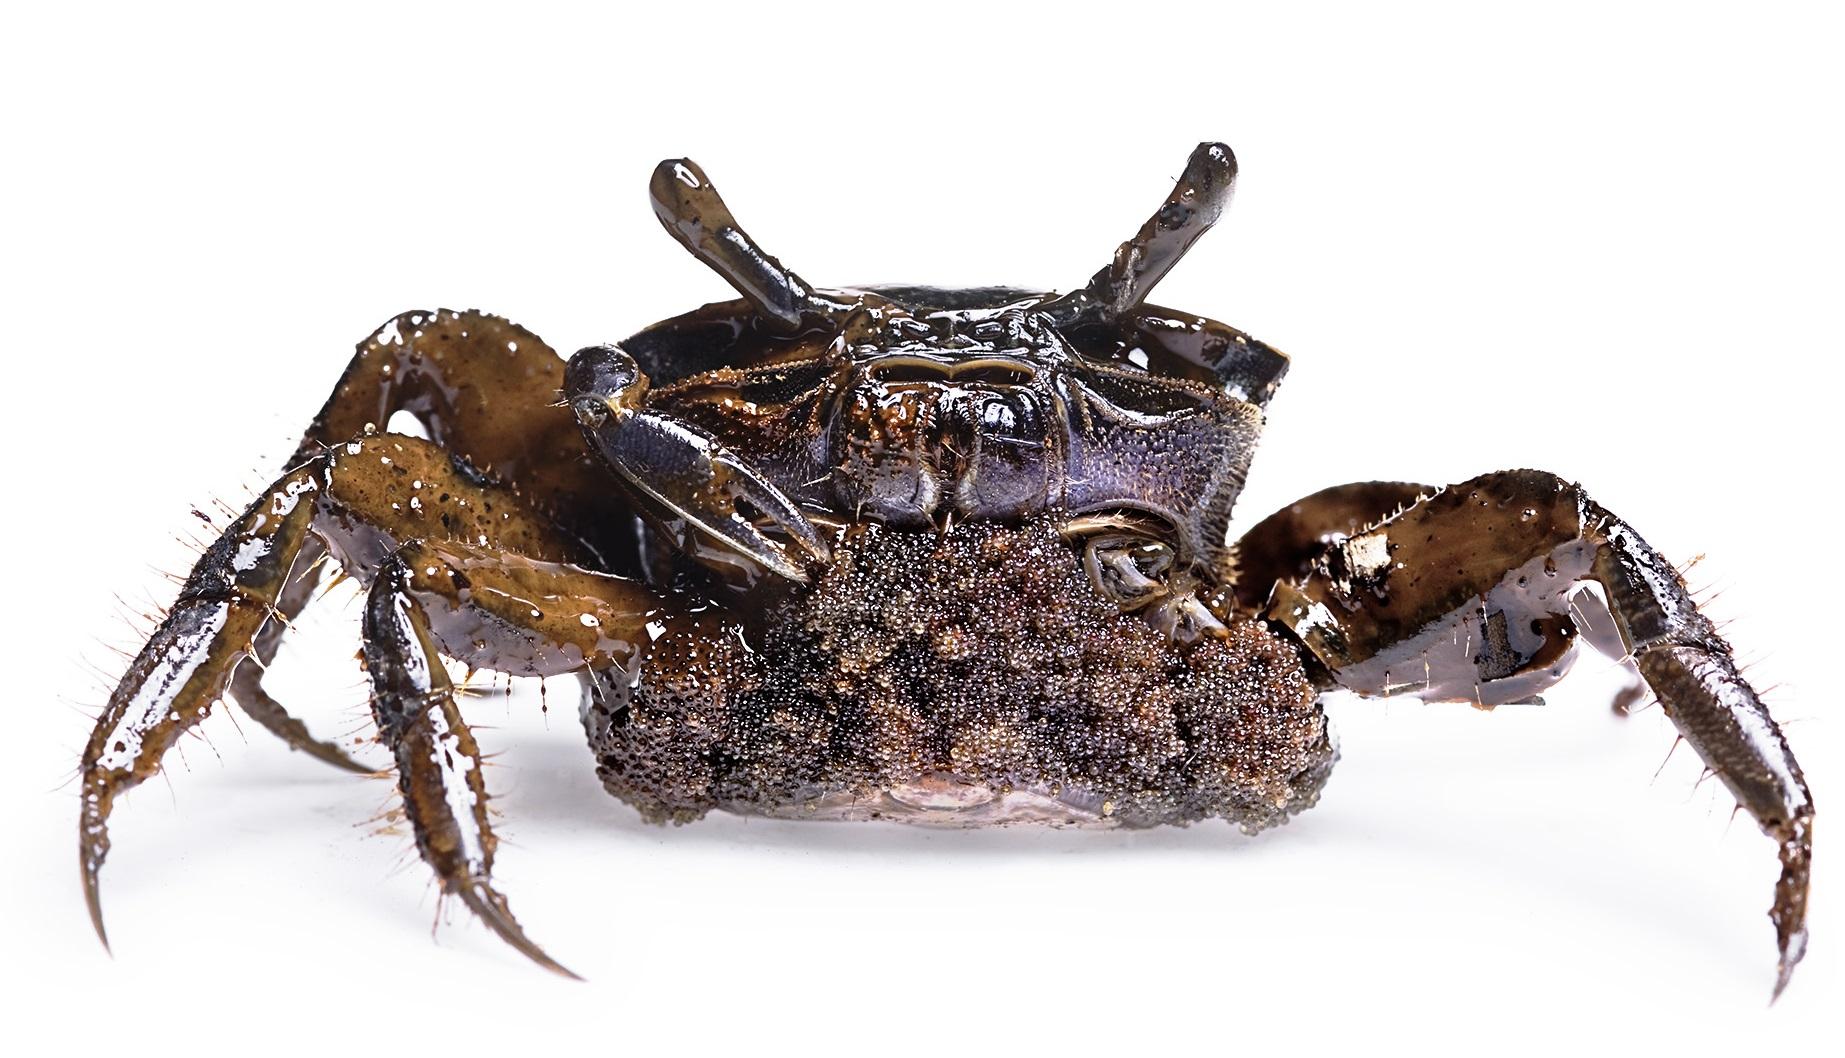 BP Gulf Oil Spill: Pregnant fiddler crab, Myrtle Grove, LA © Stephen Wilkes